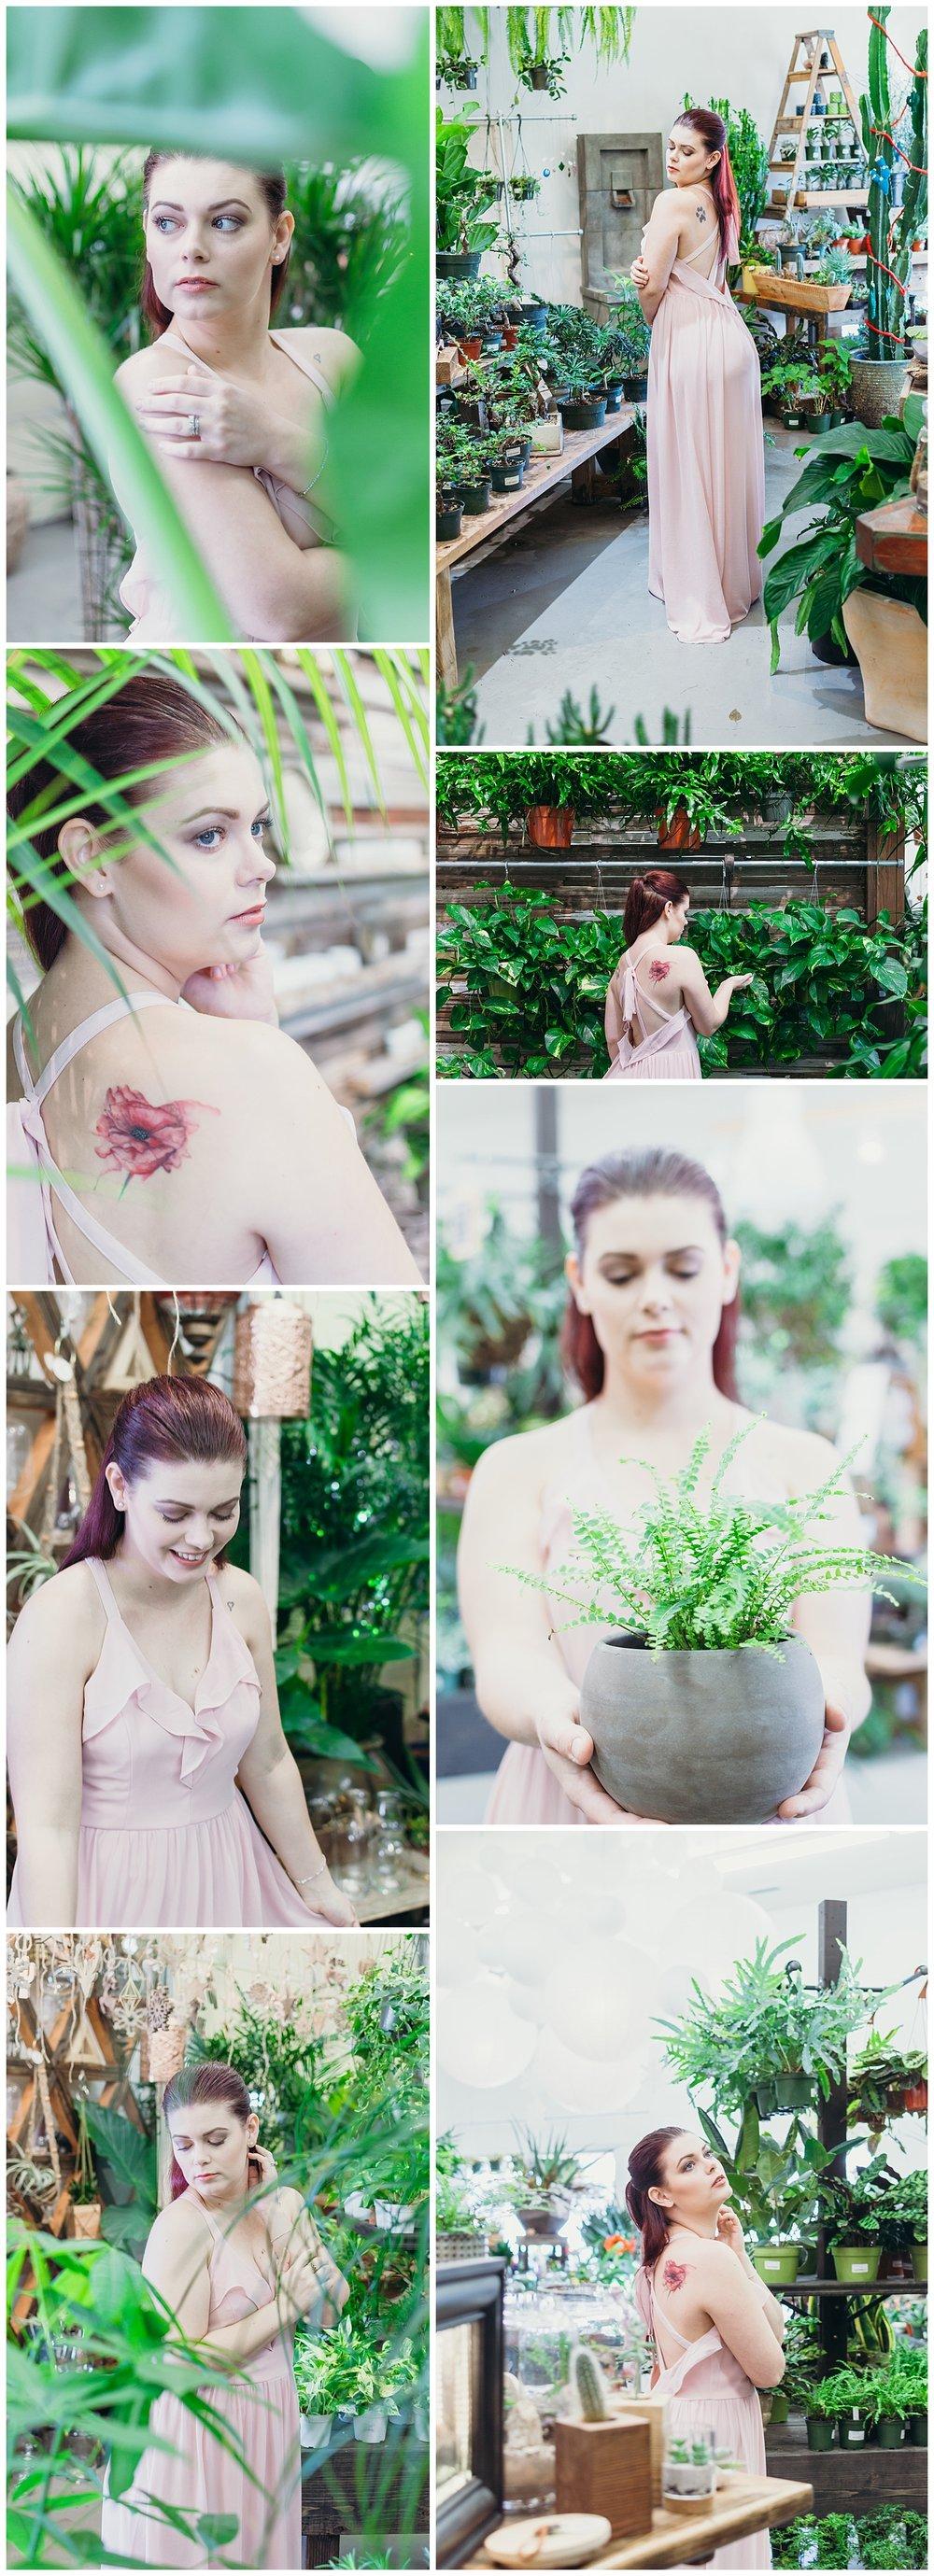 Model:  Maygen Aleice